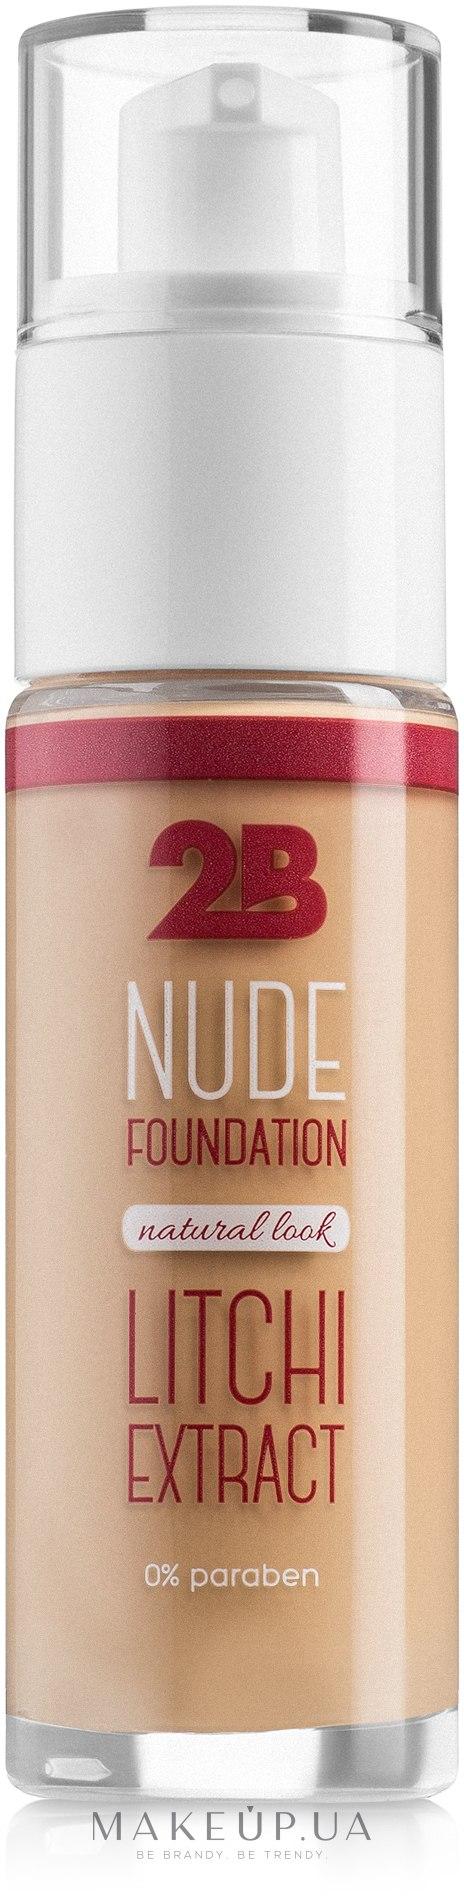 2B Mousse Foundation* - УЦЕНКА Основа-мусс под макияж